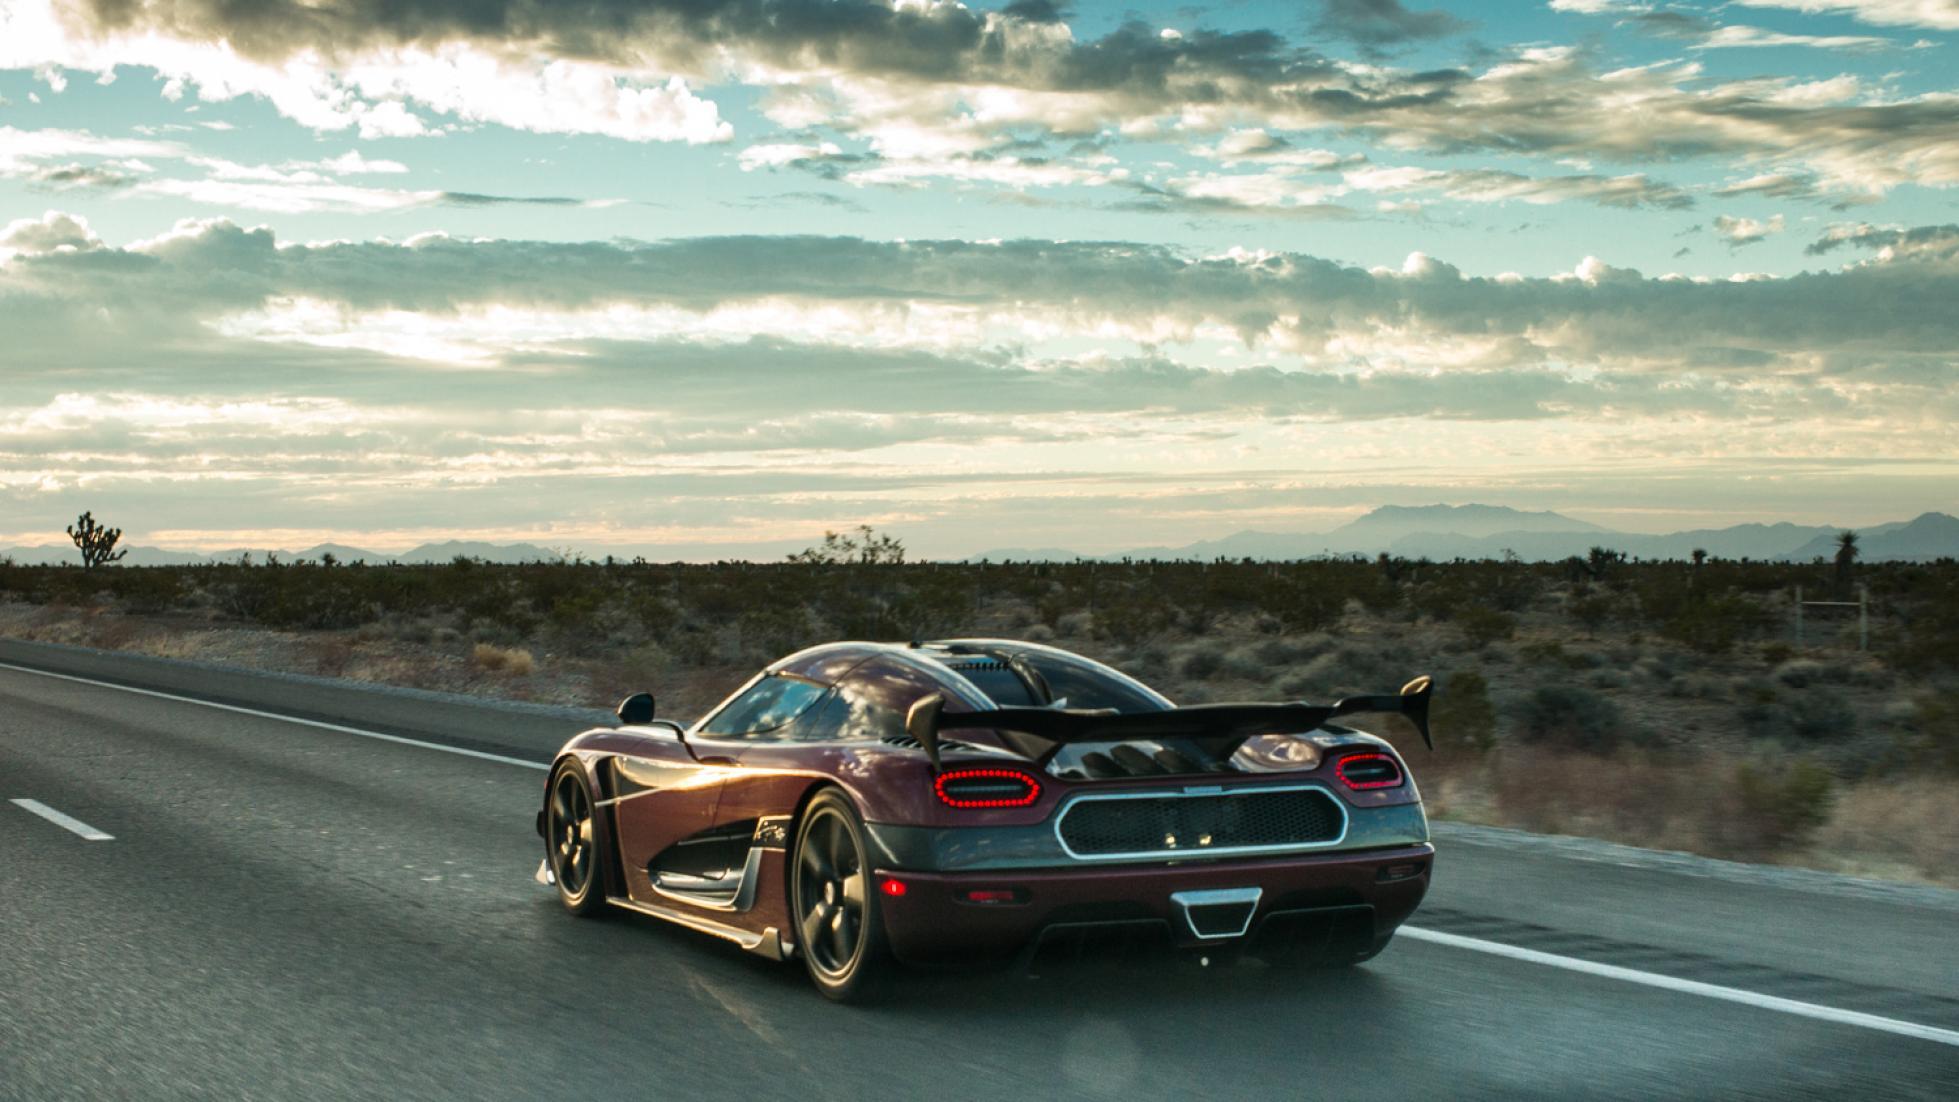 Koenigsegg smash the world's fastest car record!